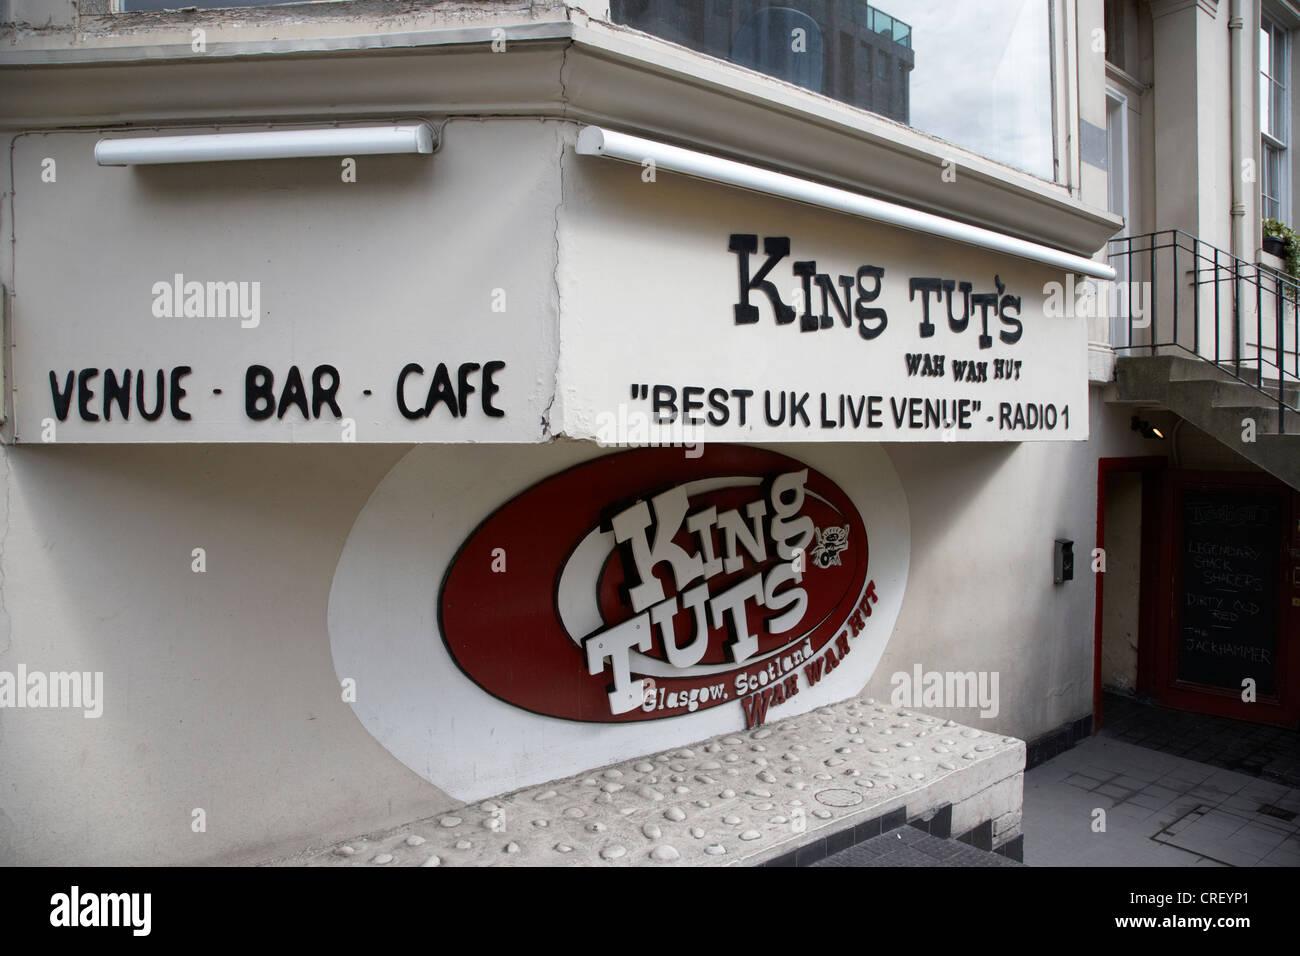 king tut's wah wah hut music venue glasgow scotland uk - Stock Image